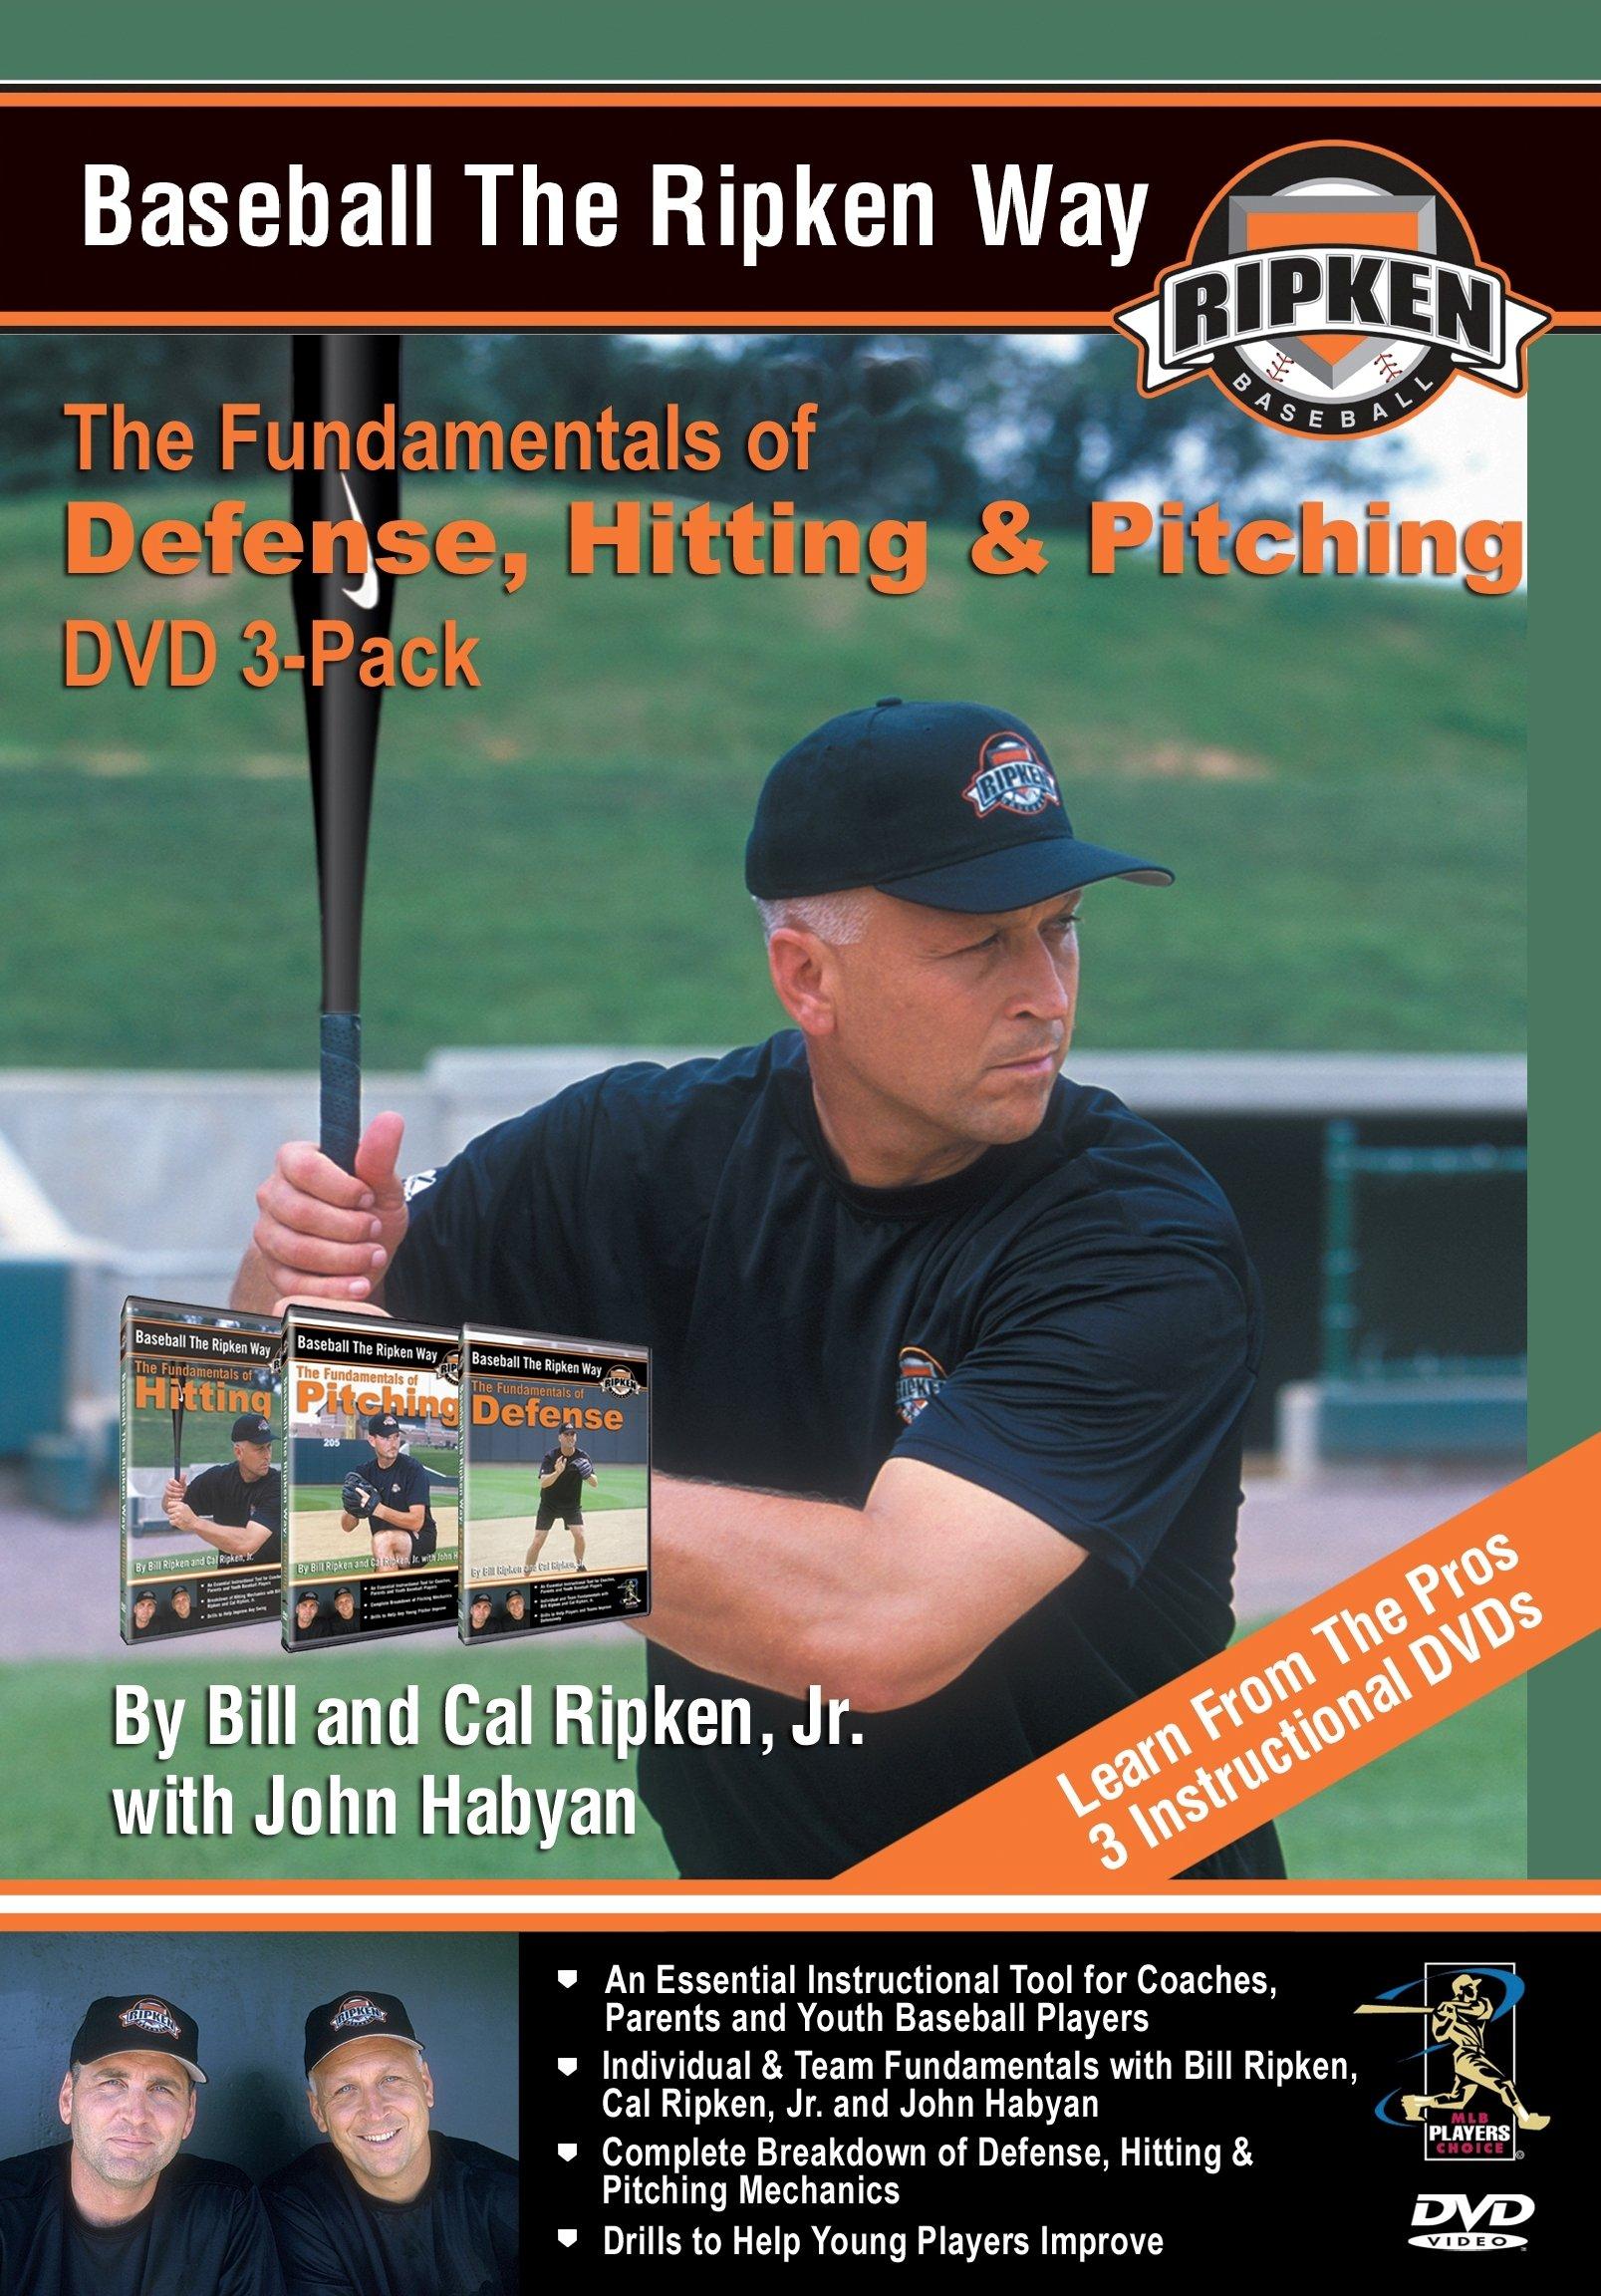 Baseball the Ripken Way DVD 3-Pack by Elite Sports